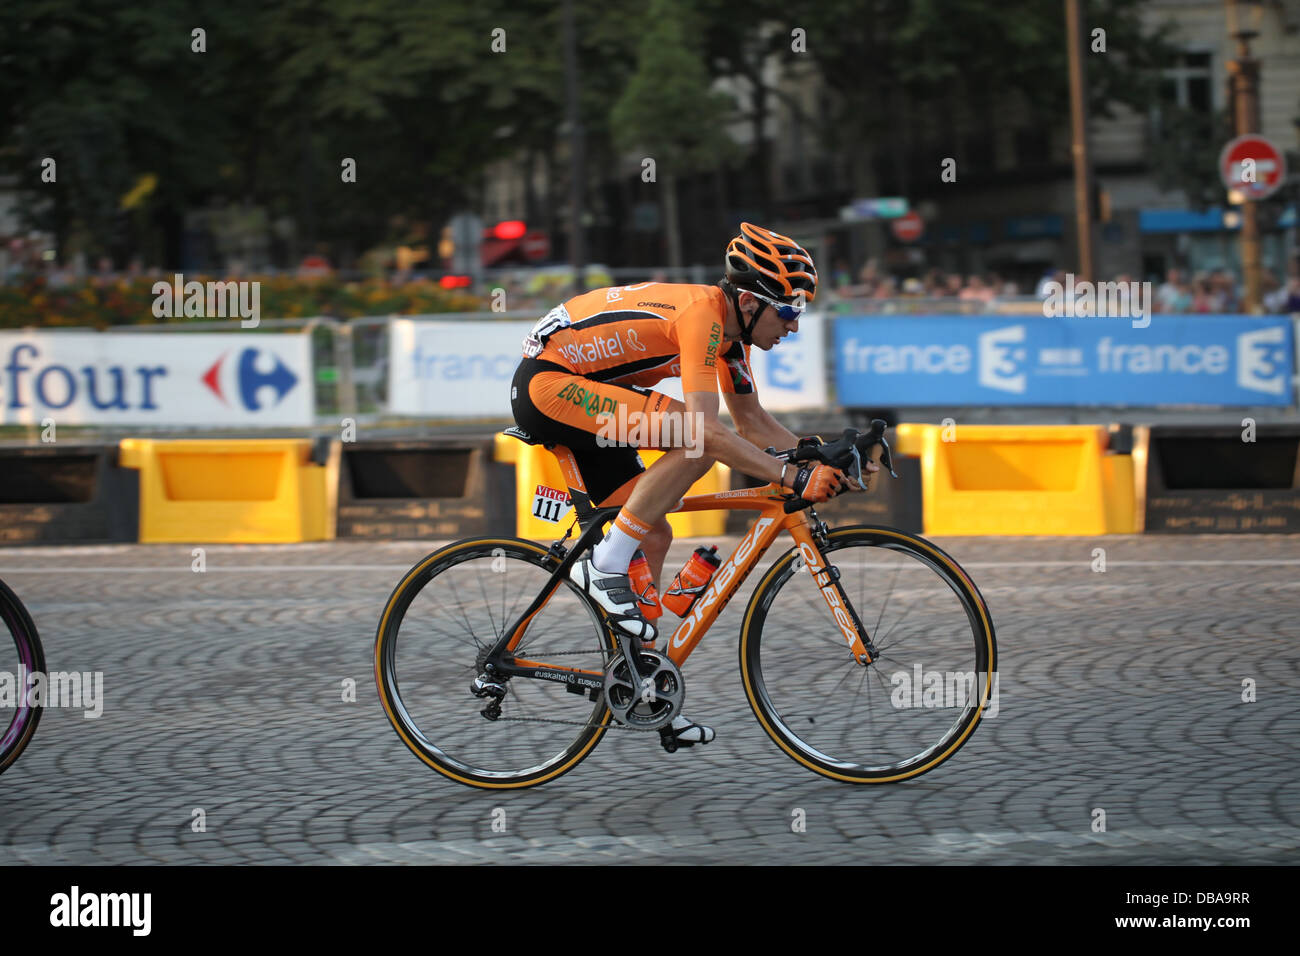 Igor Anton Hernandez of team Euskaltel Euskadi, riding the final stage of the 2013 Tour de France on the Champs - Stock Image